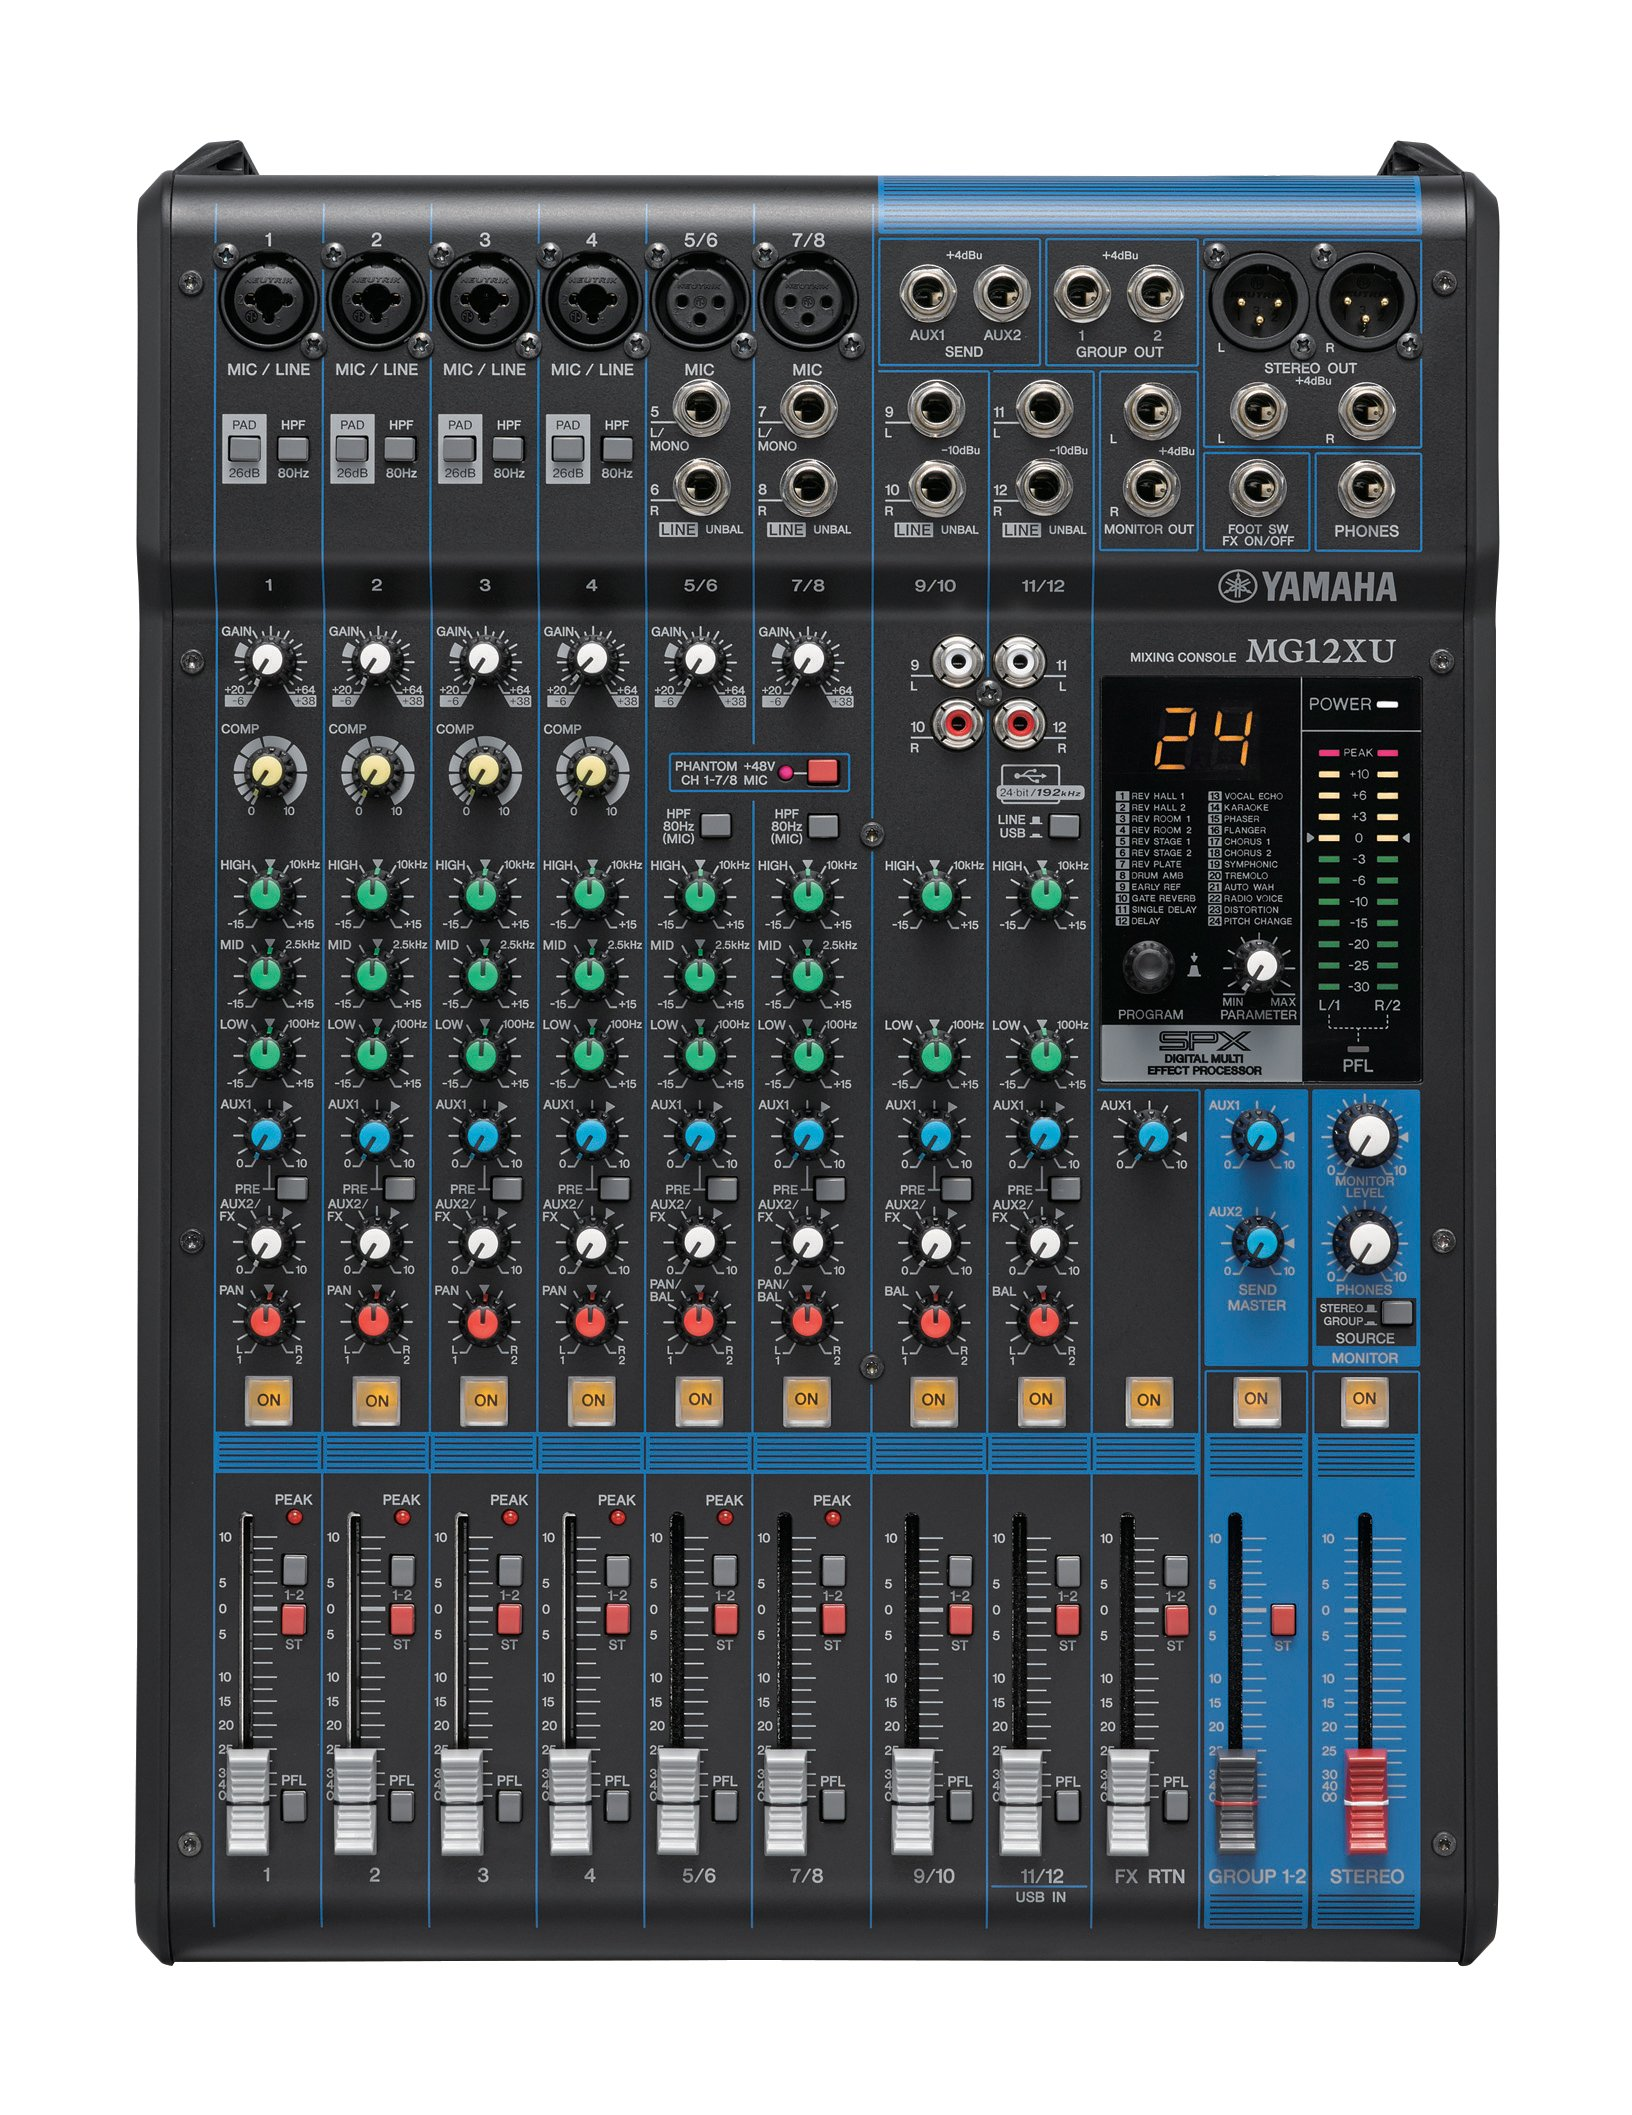 c701684925 Get Quotations · Yamaha MG12XU 12-Input 4-Bus Mixer with Effects